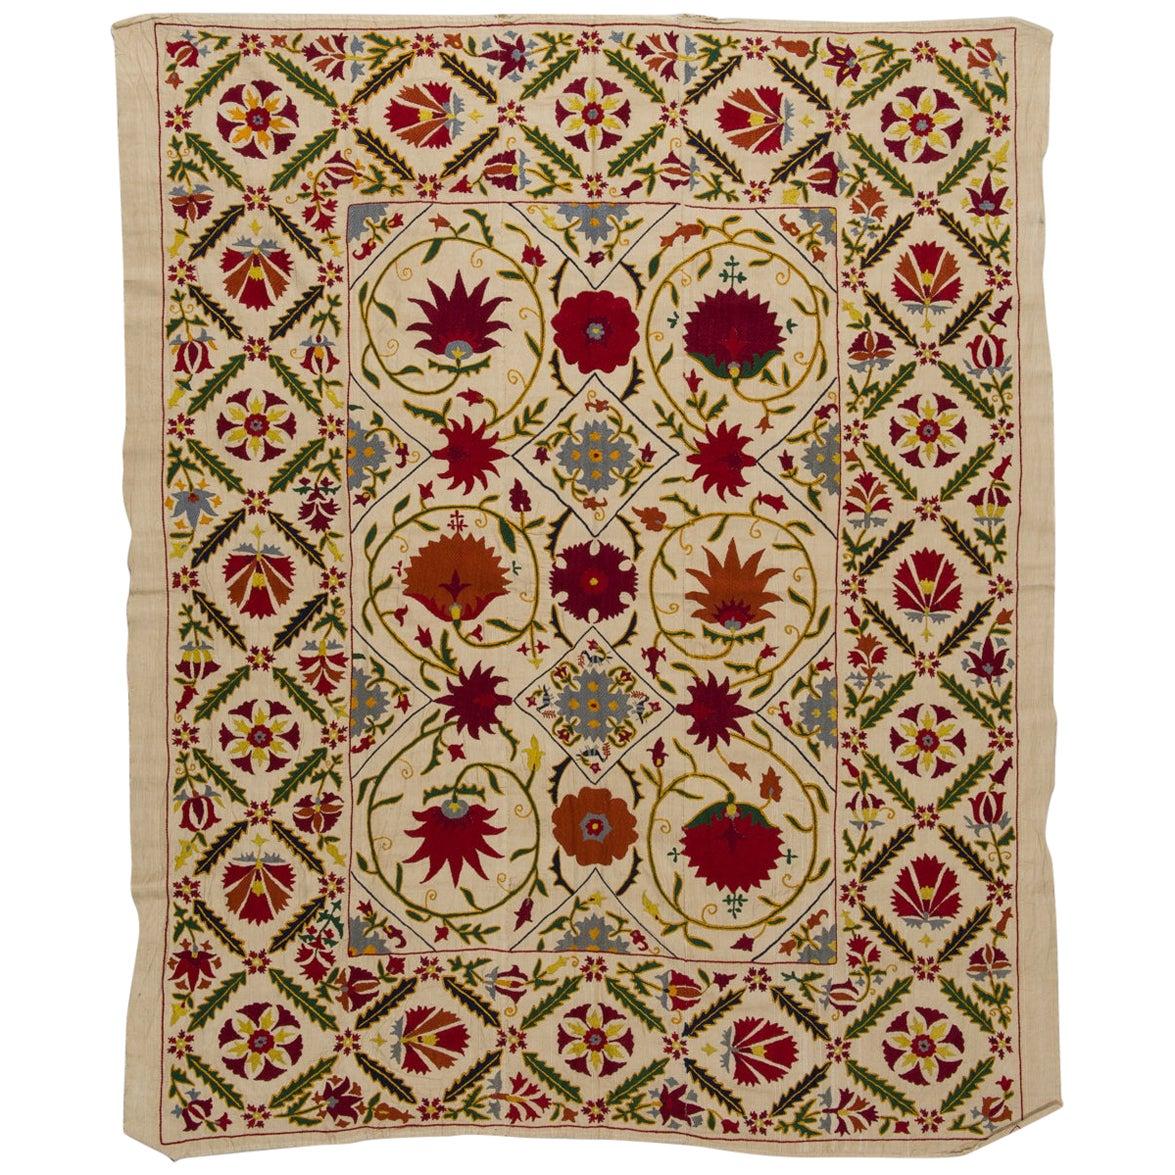 Old Silk SUSANI Embroidery